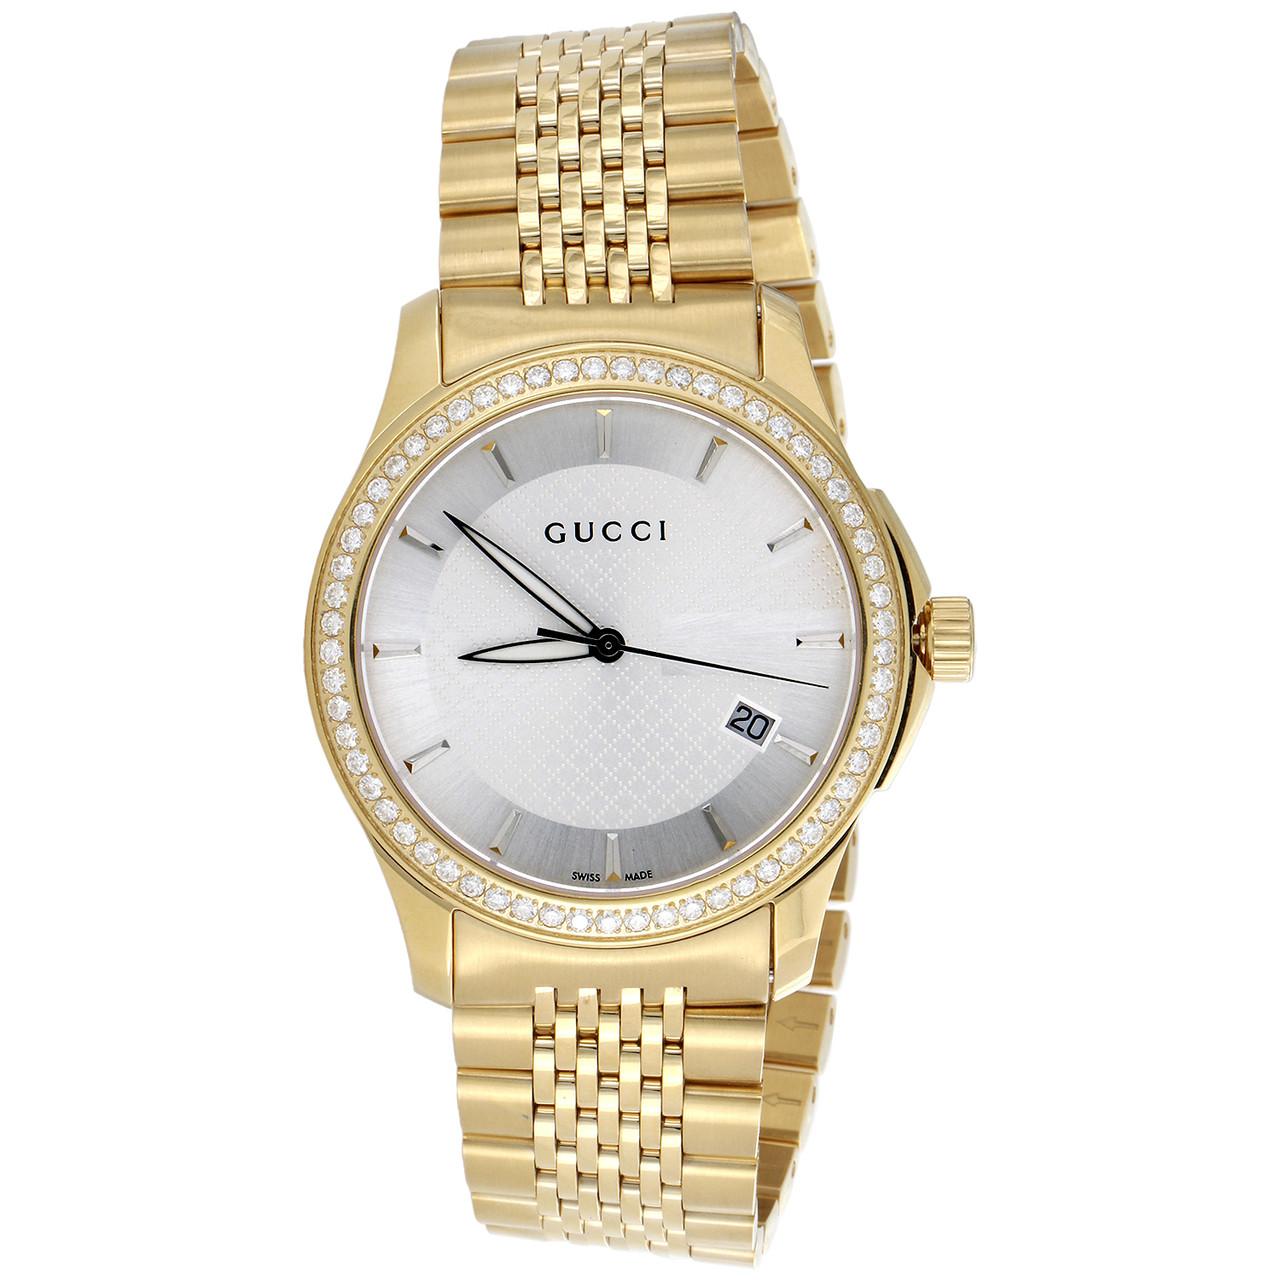 099b4147a82 ... Gucci Ya126402 Diamond Watch White Dial G Timeless 38mm Gold PVD Steel  1.75 CT. Image 1